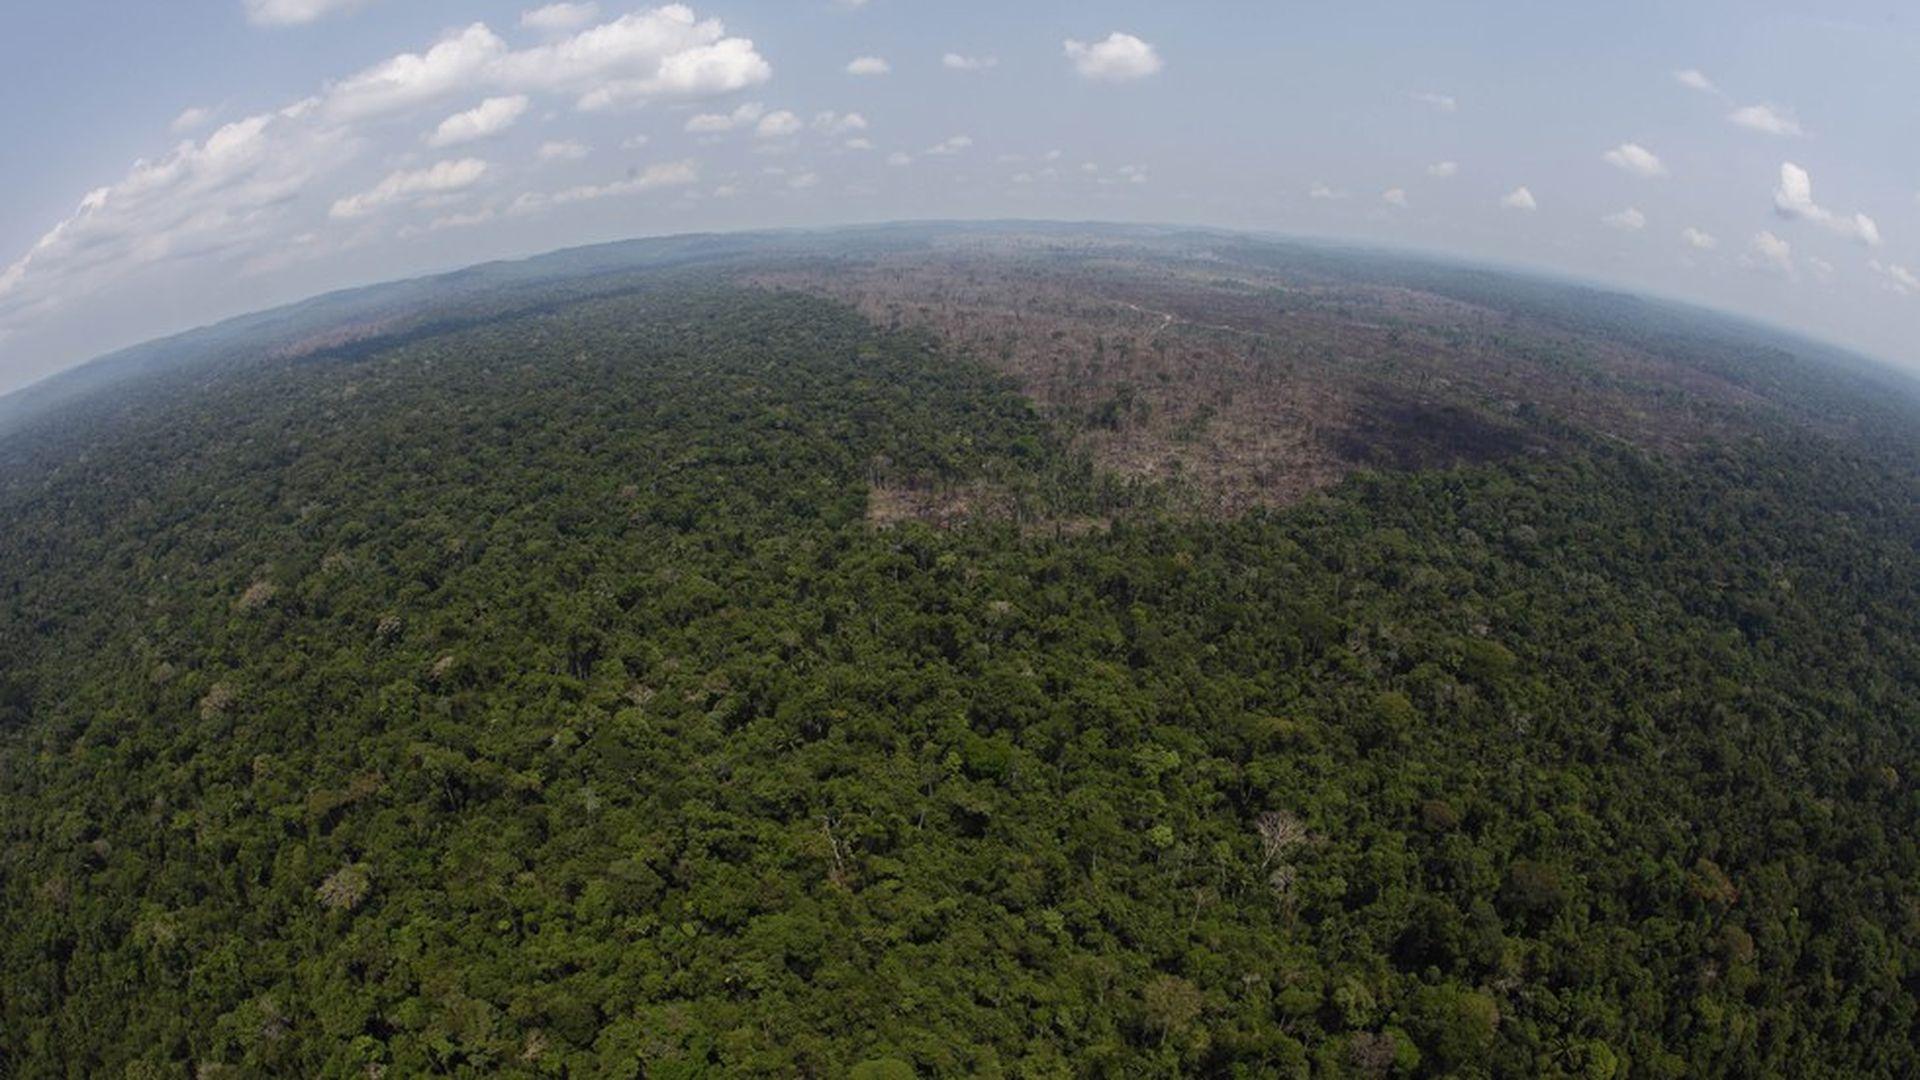 The Amazon's trees can make it rain